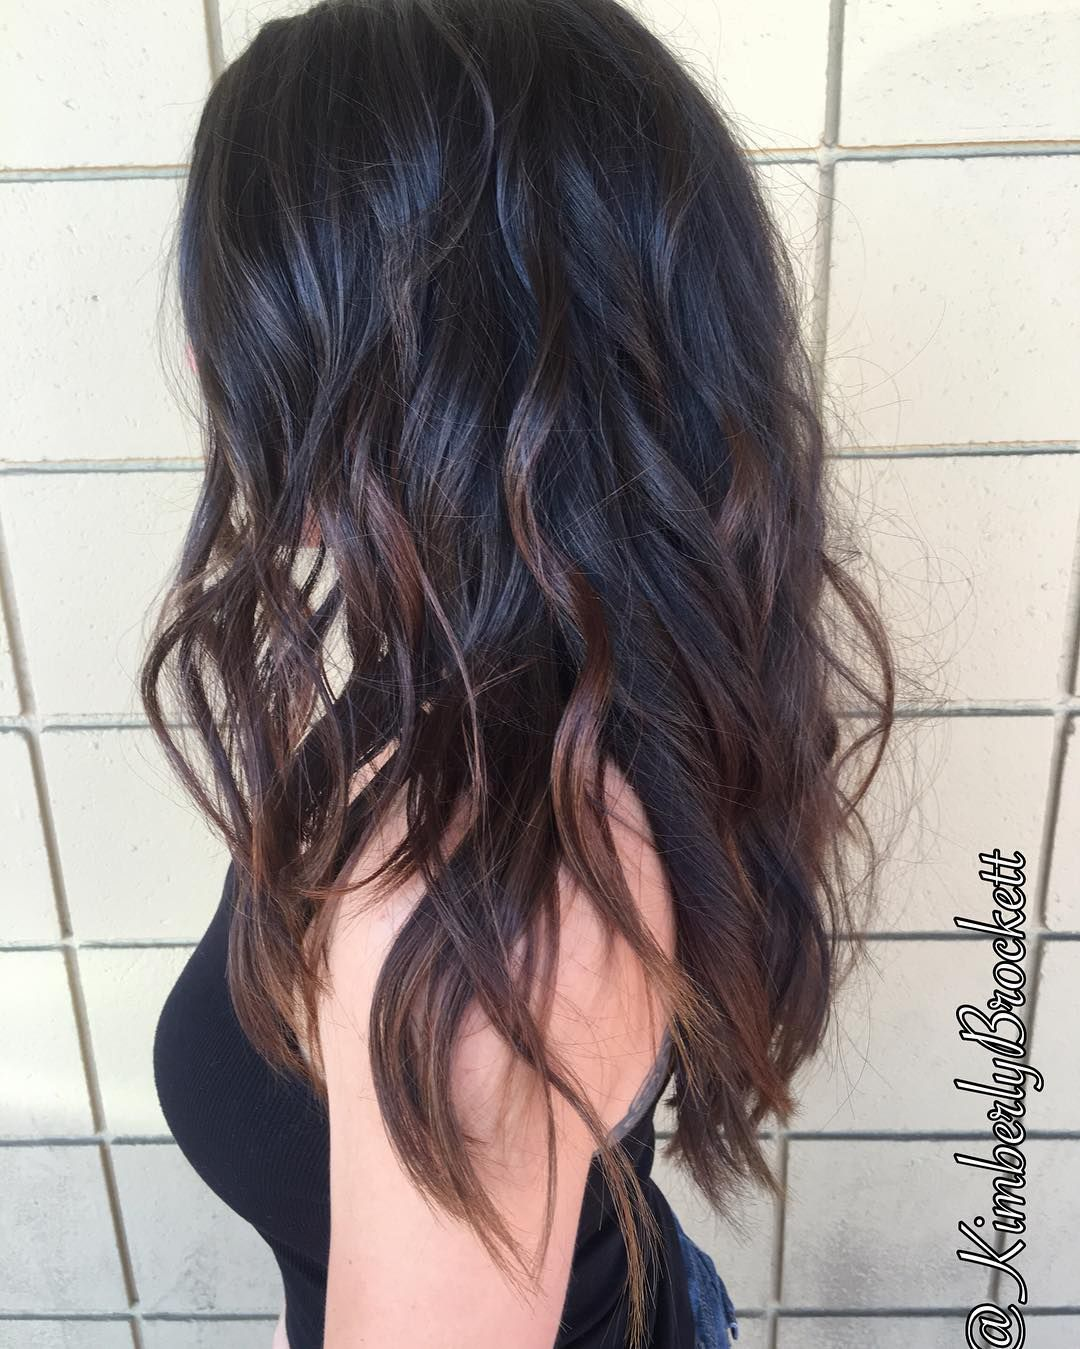 Wavy black long layered hair with chocolatebrown balayage hair